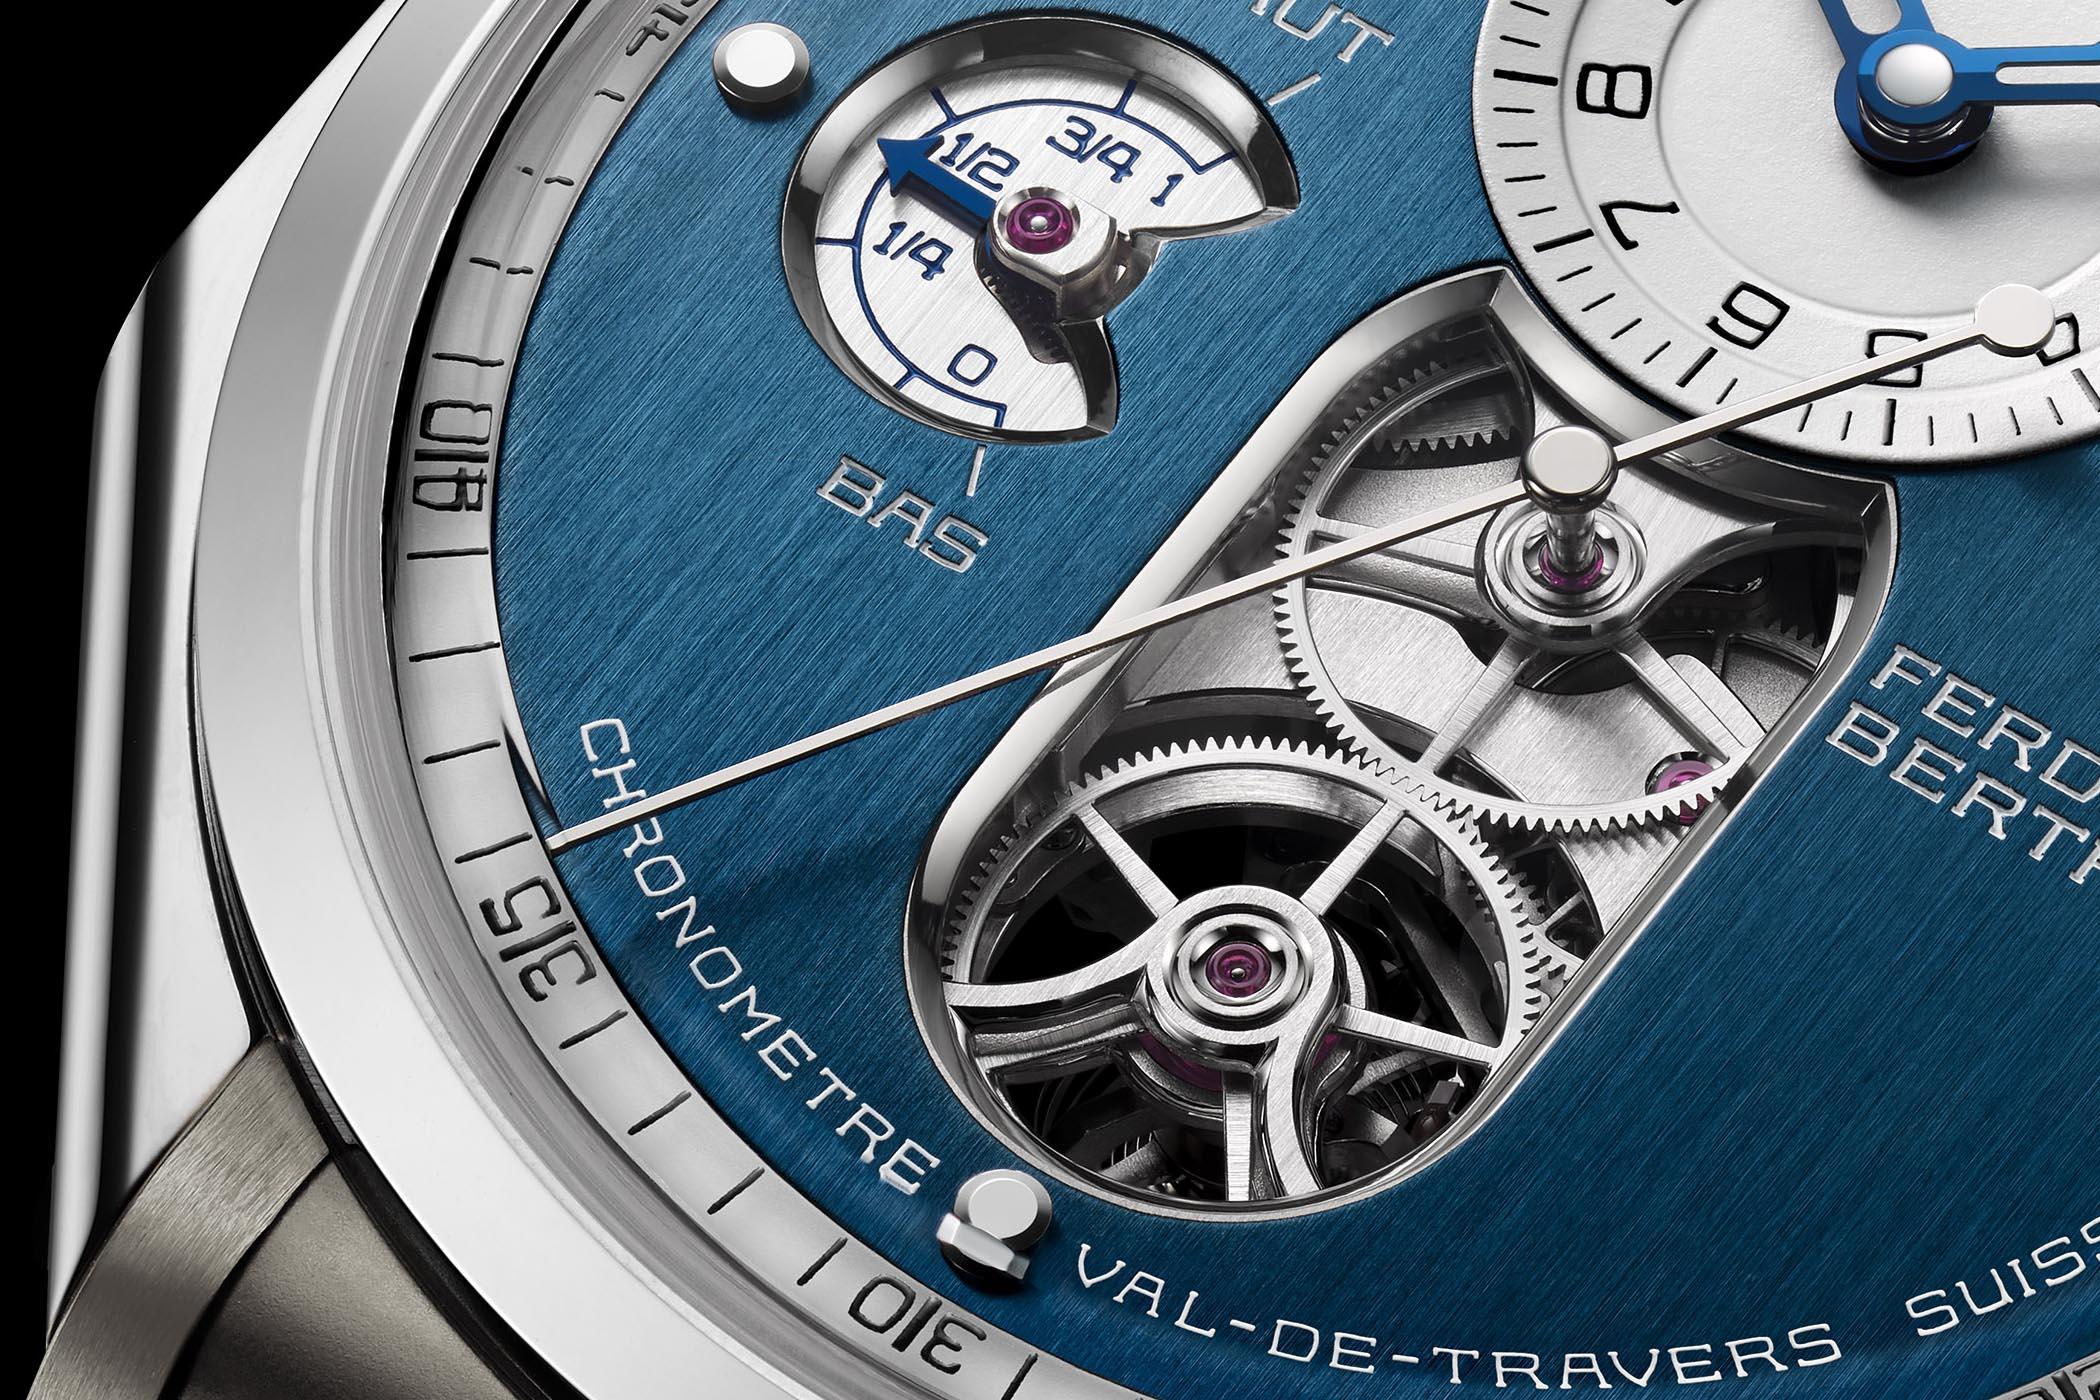 https://k8q7r7a2.stackpathcdn.com/wp-content/uploads/2019/11/Ferdinand-Berthoud-FB-1.3-1-Sapphire-Blue-Chronometer-2.jpg